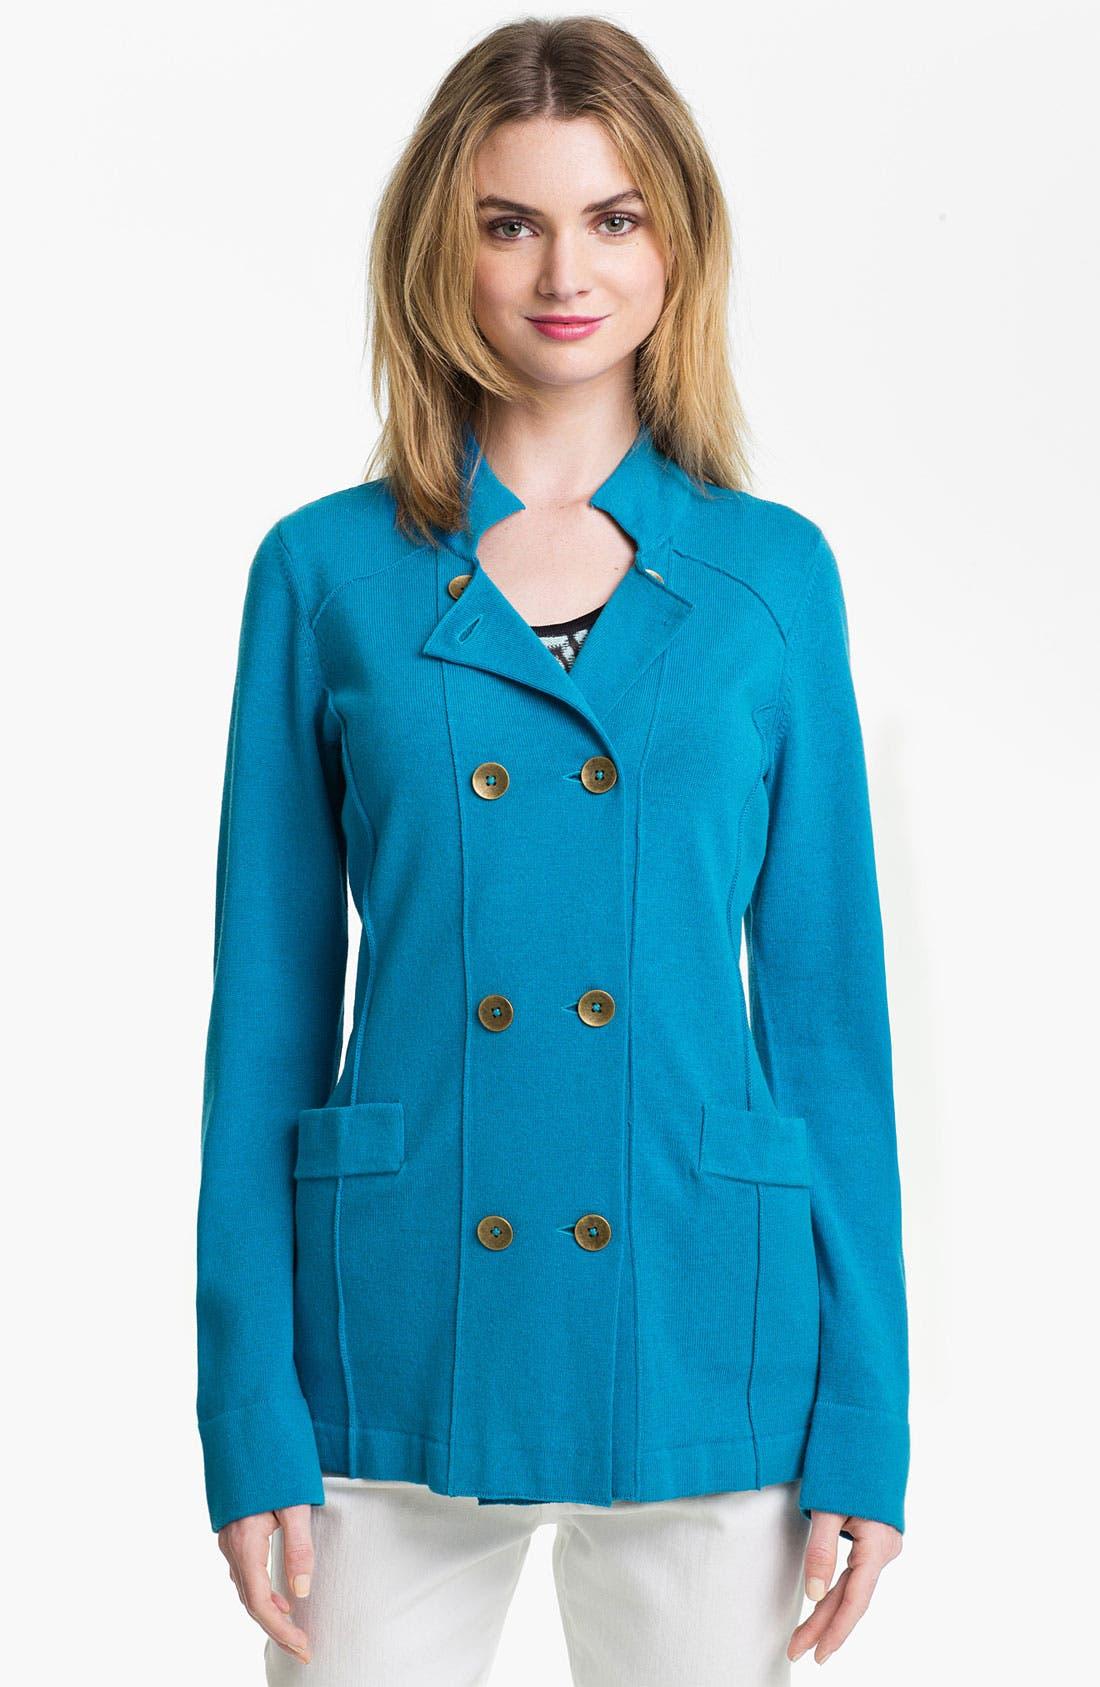 Main Image - Nic + Zoe Double Breasted Knit Jacket